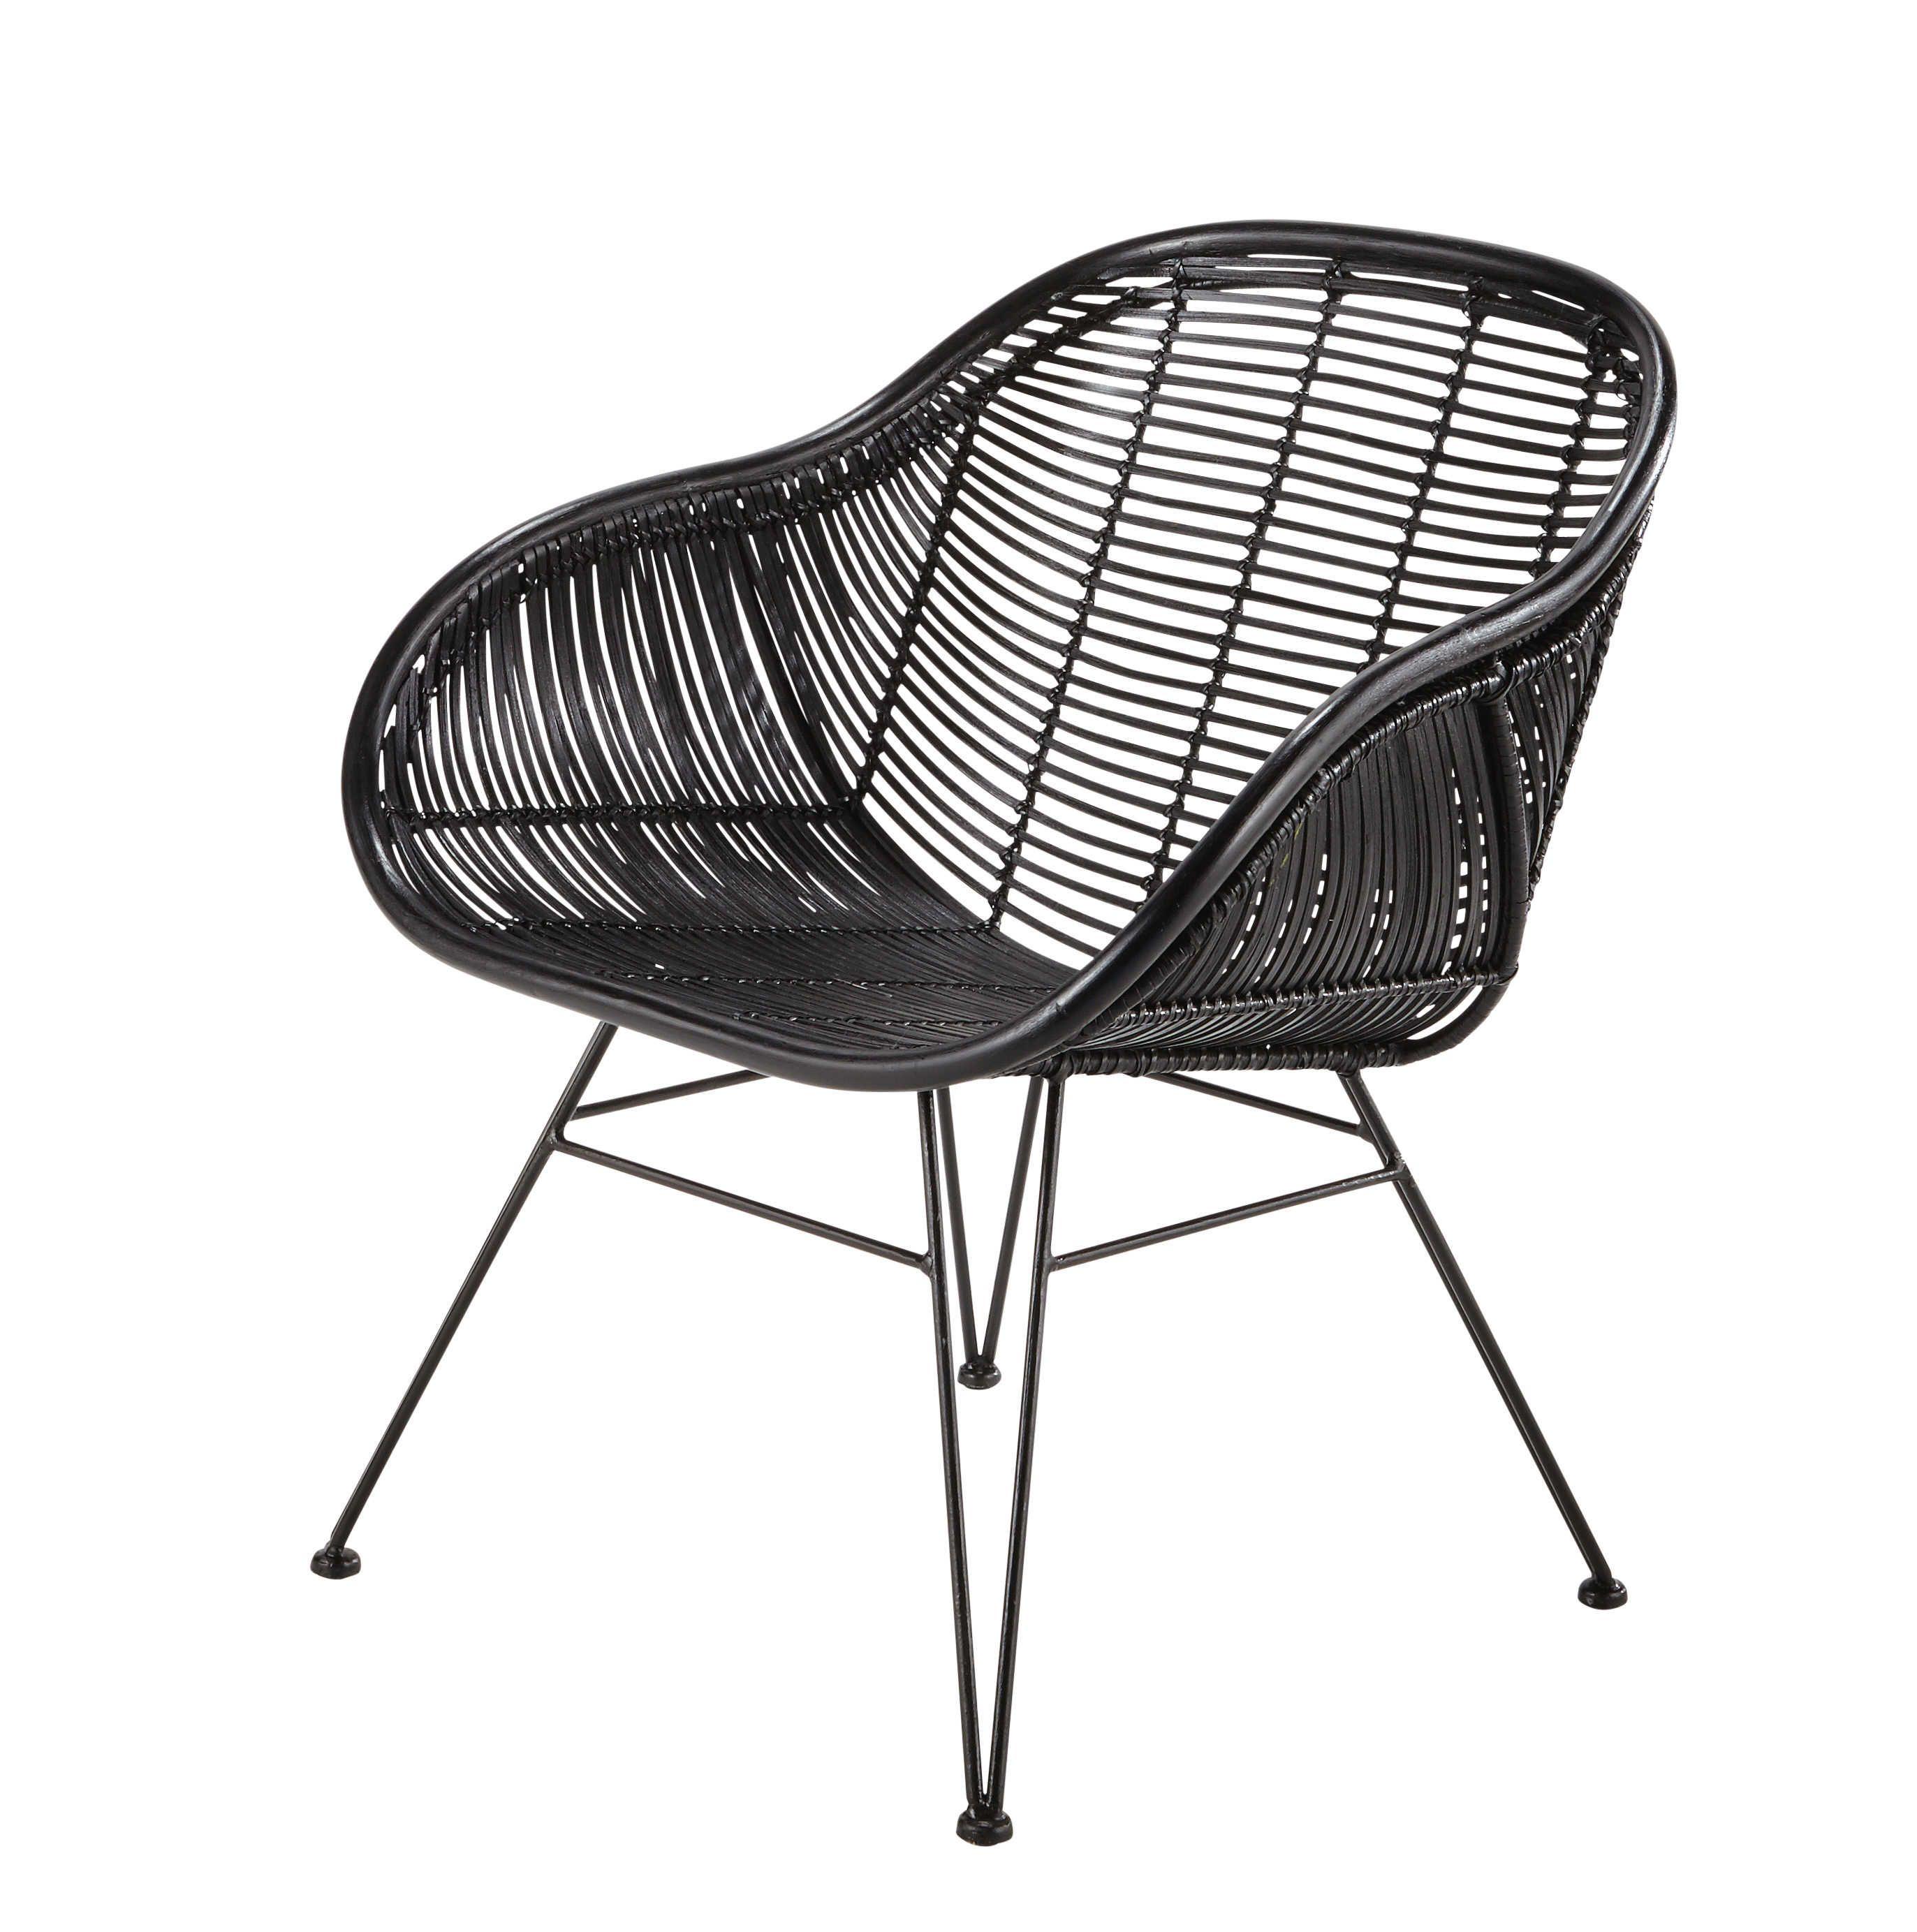 Seating Rattan Armchair Black Rattan Chair Rattan